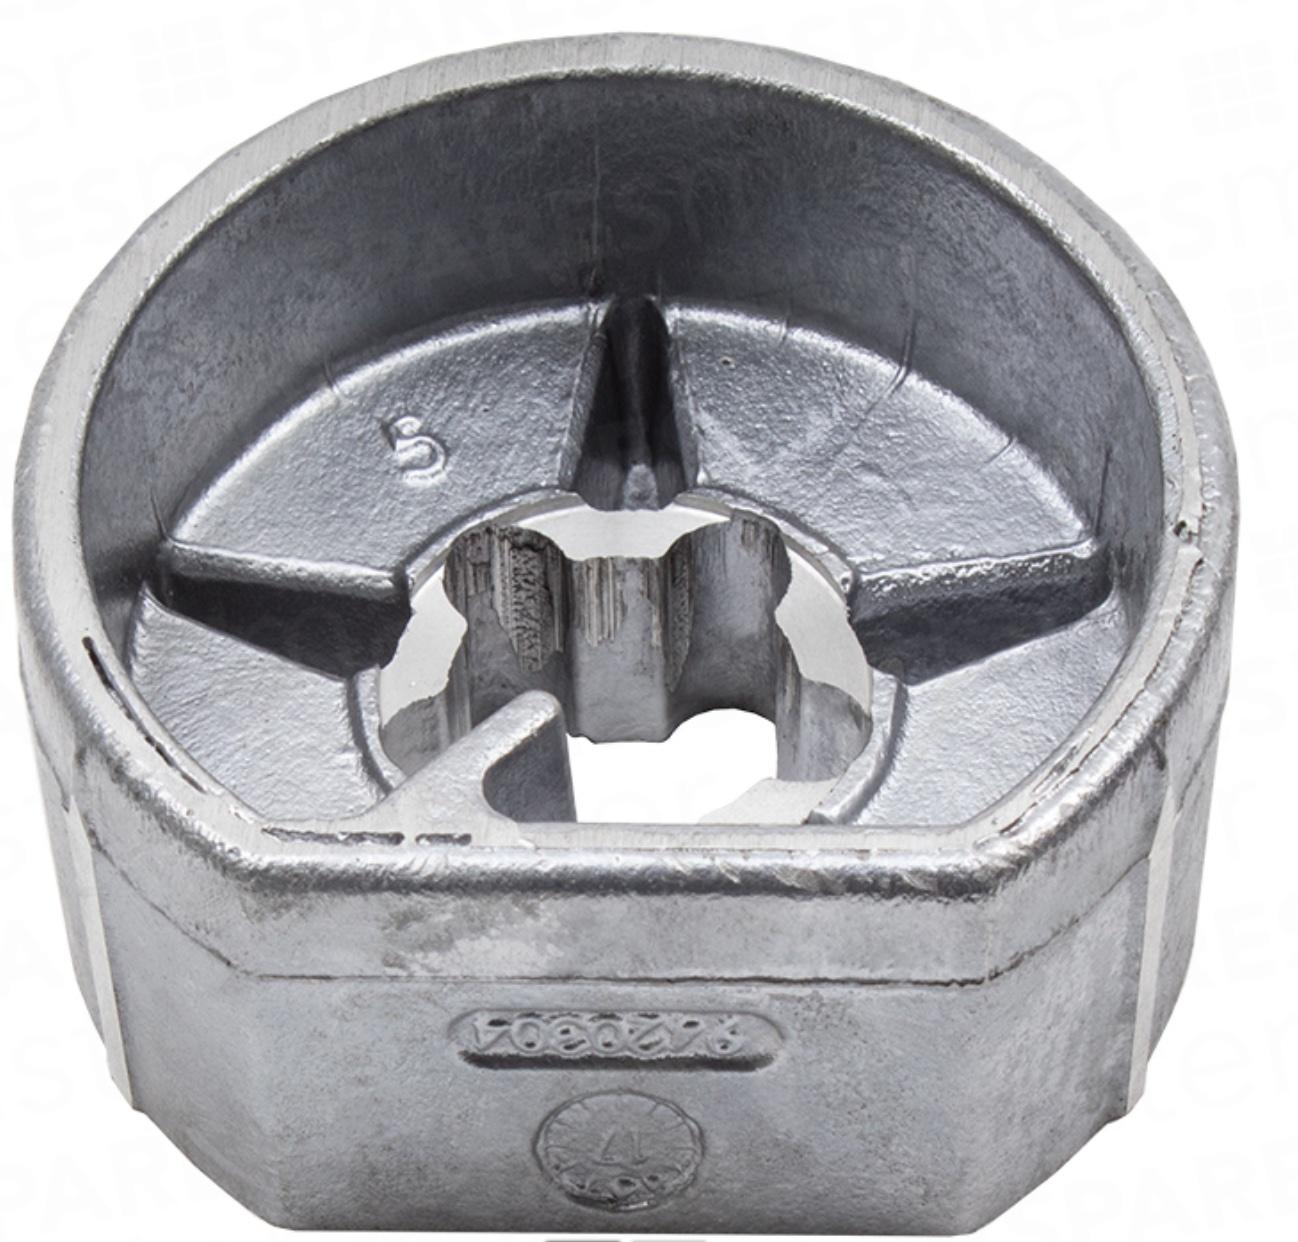 Somfy Tubular Roller Shutter Motor Drive Somfy 4″ 16 SWG Drive Wheel